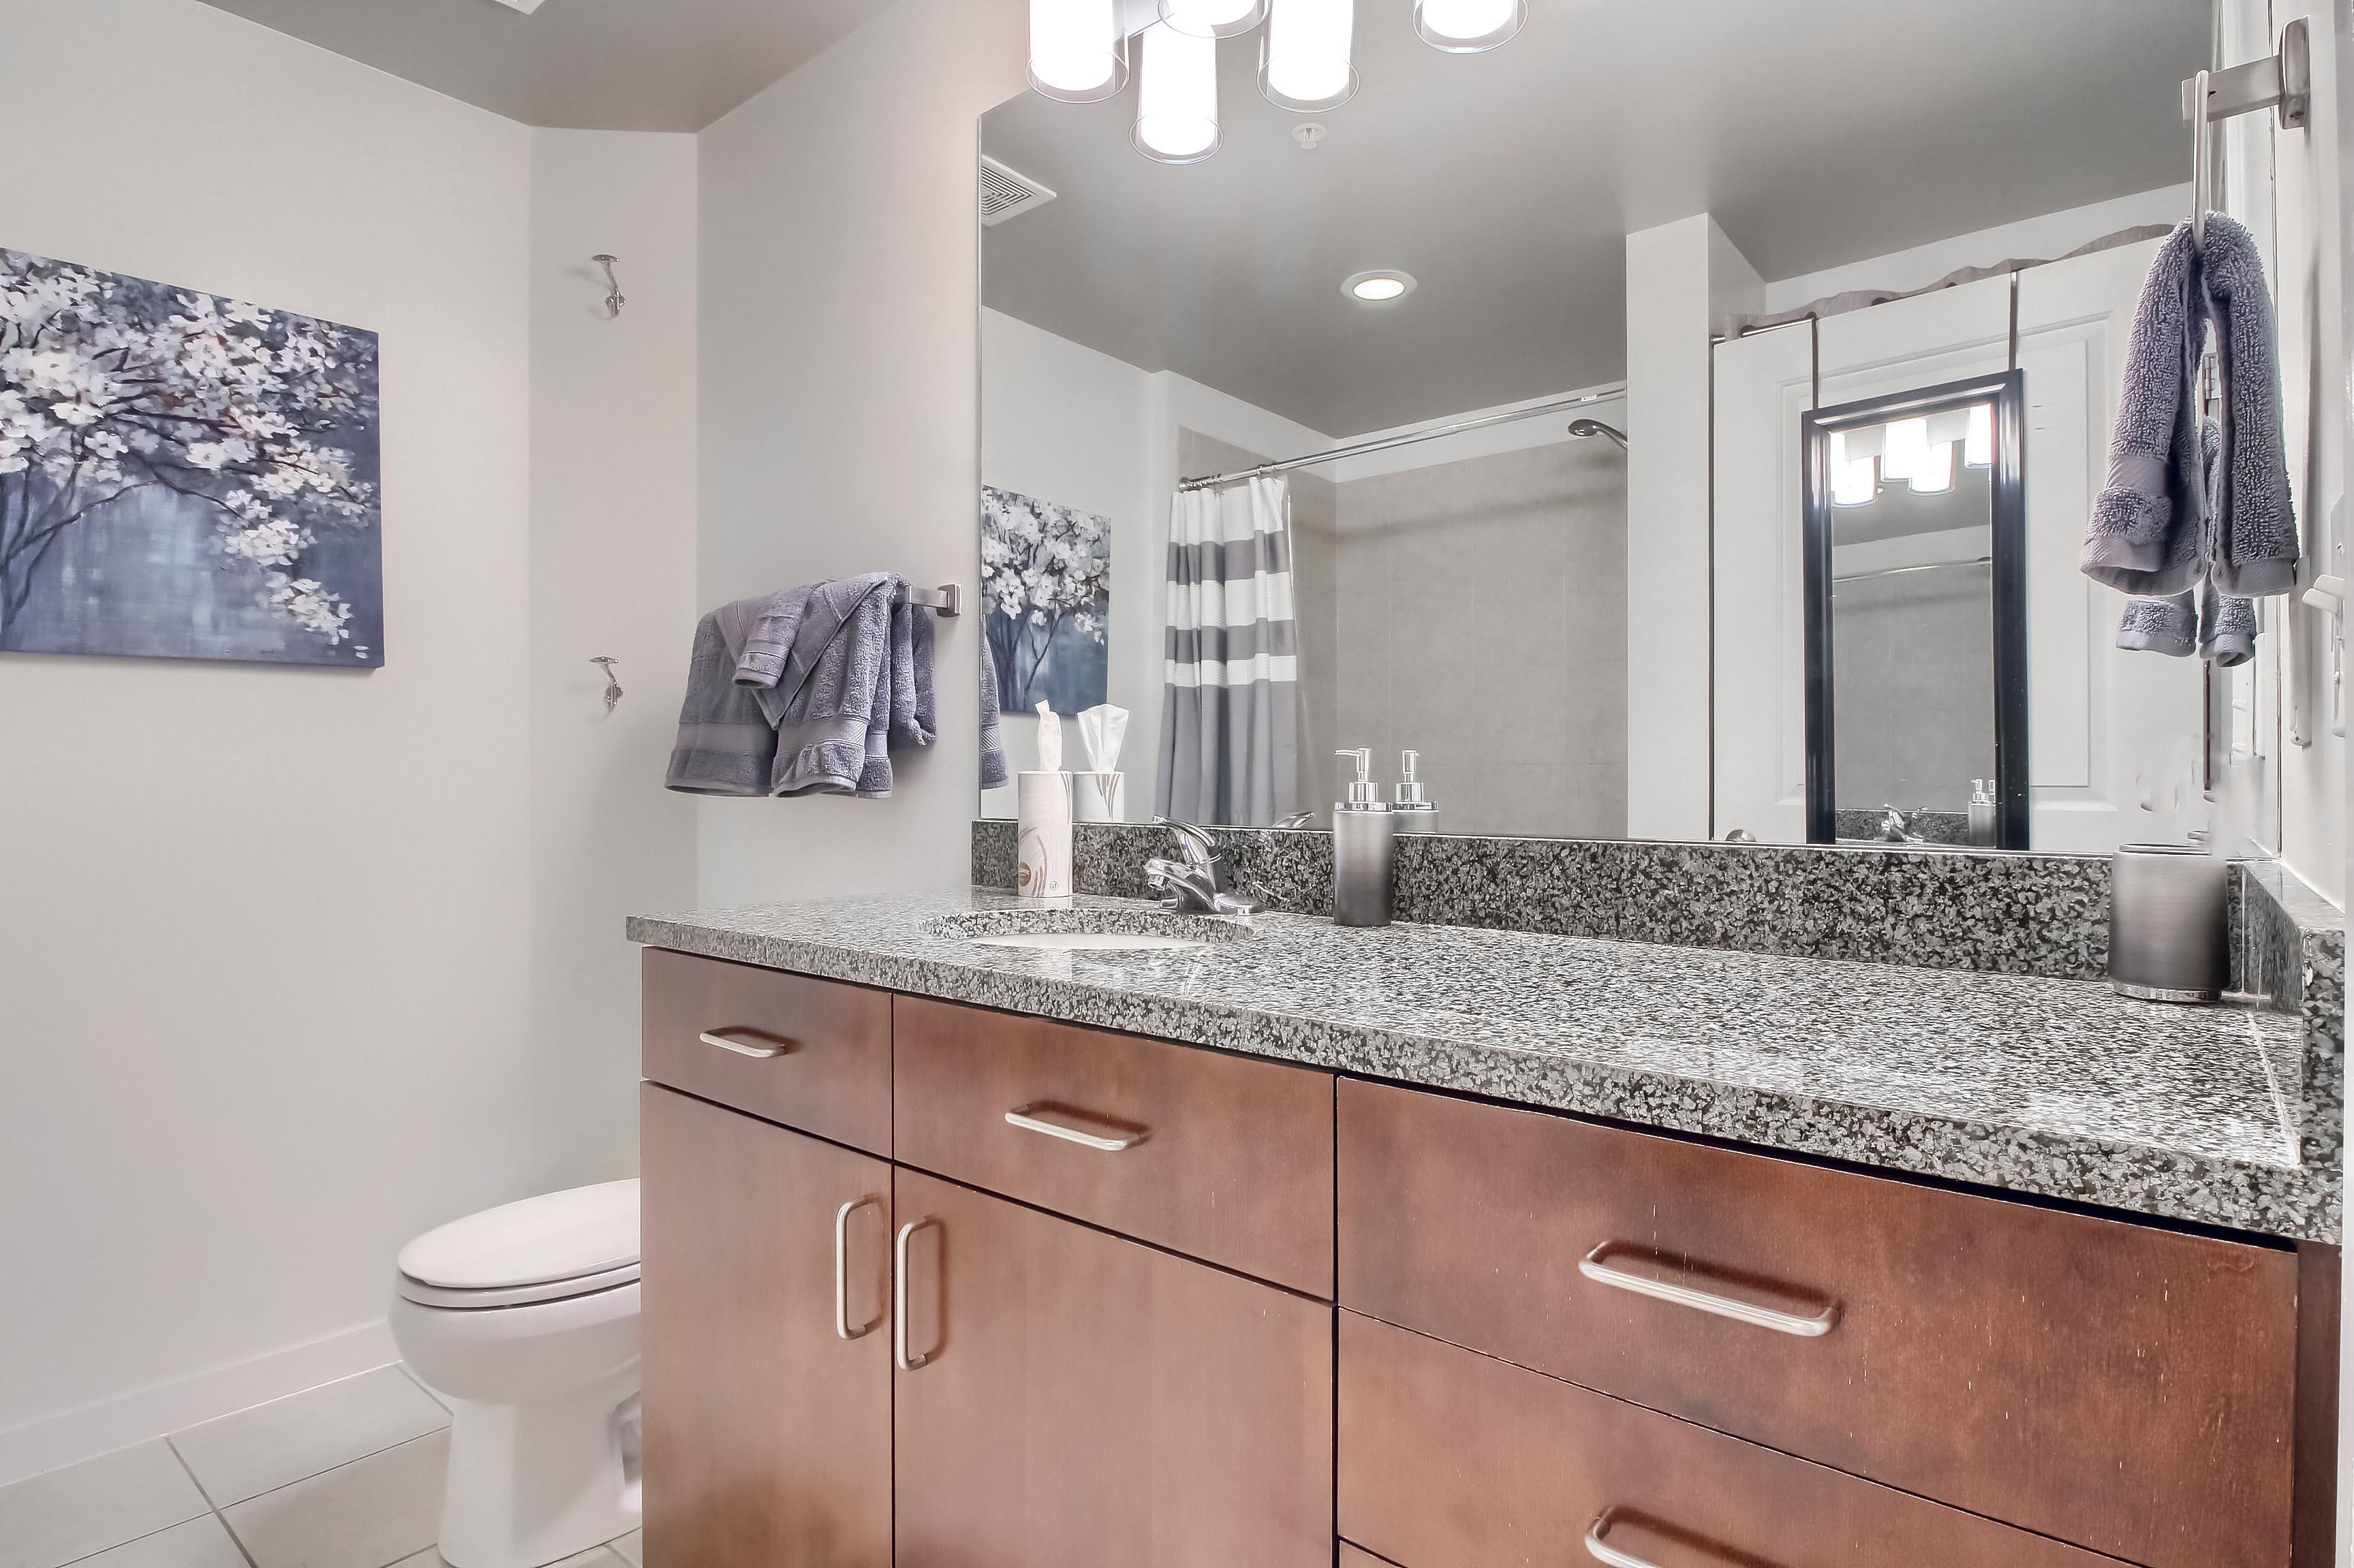 05_Main_Bathroom__MG_1142.JPG